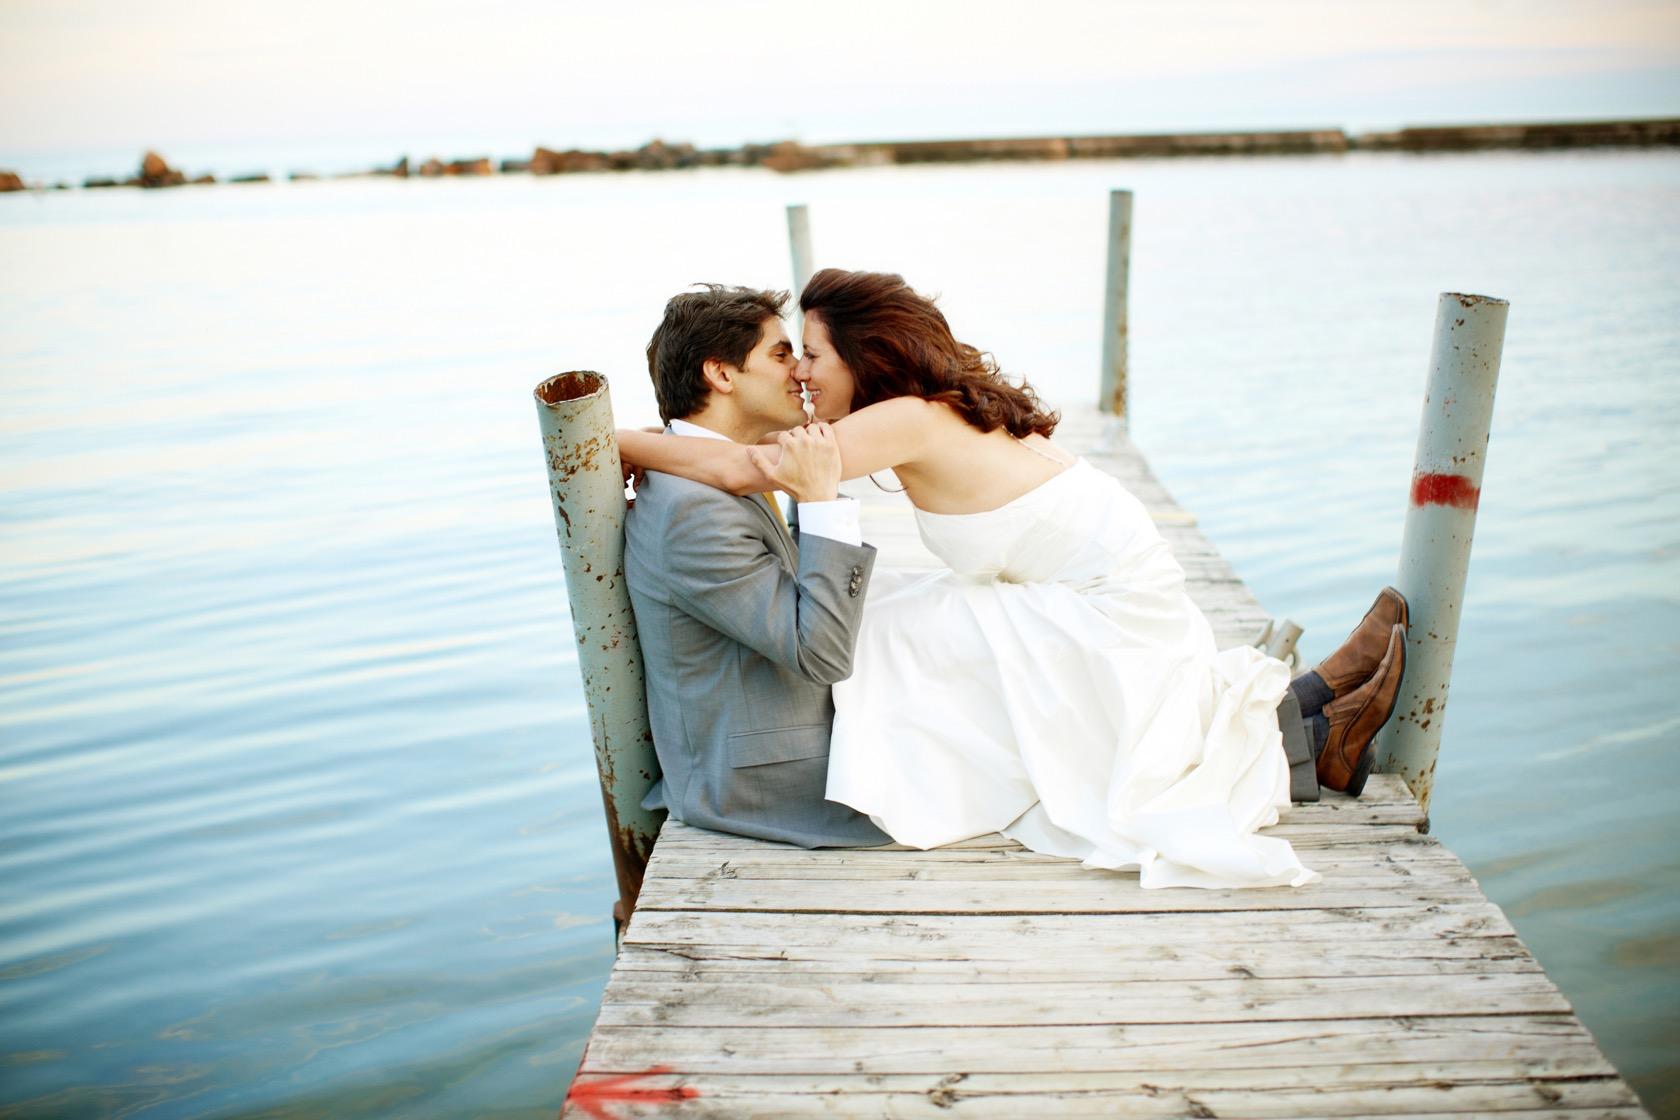 stephen sager photography 2000 toronto wedding photography